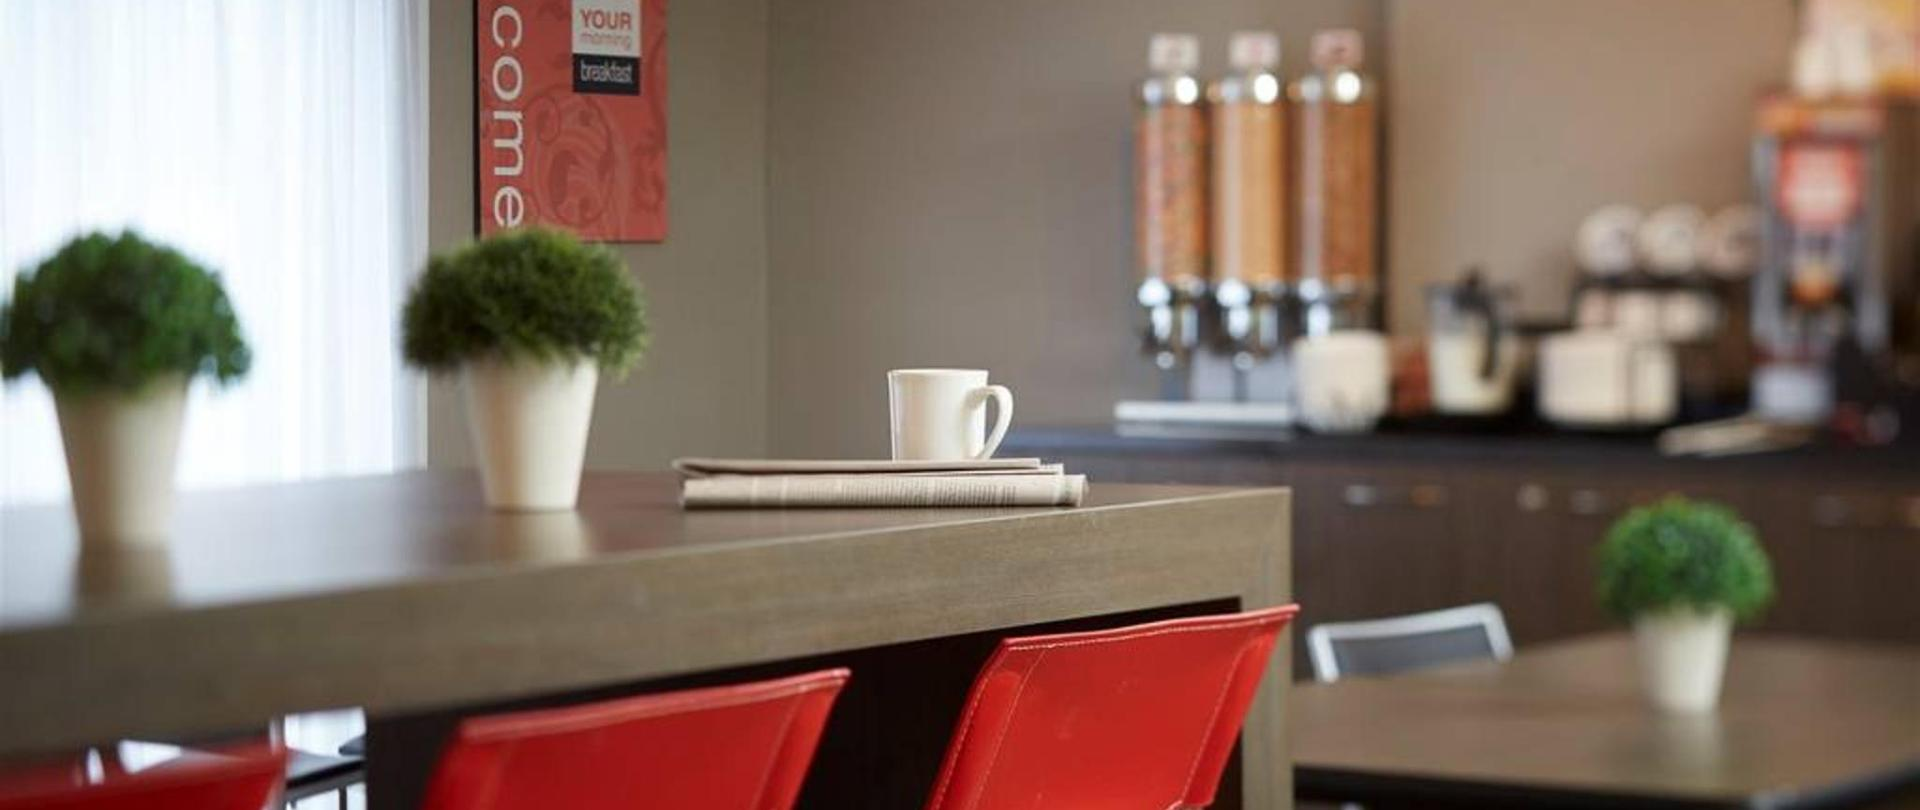 09-join-us-in-the-breakfast-room.jpg.1024x0.jpg